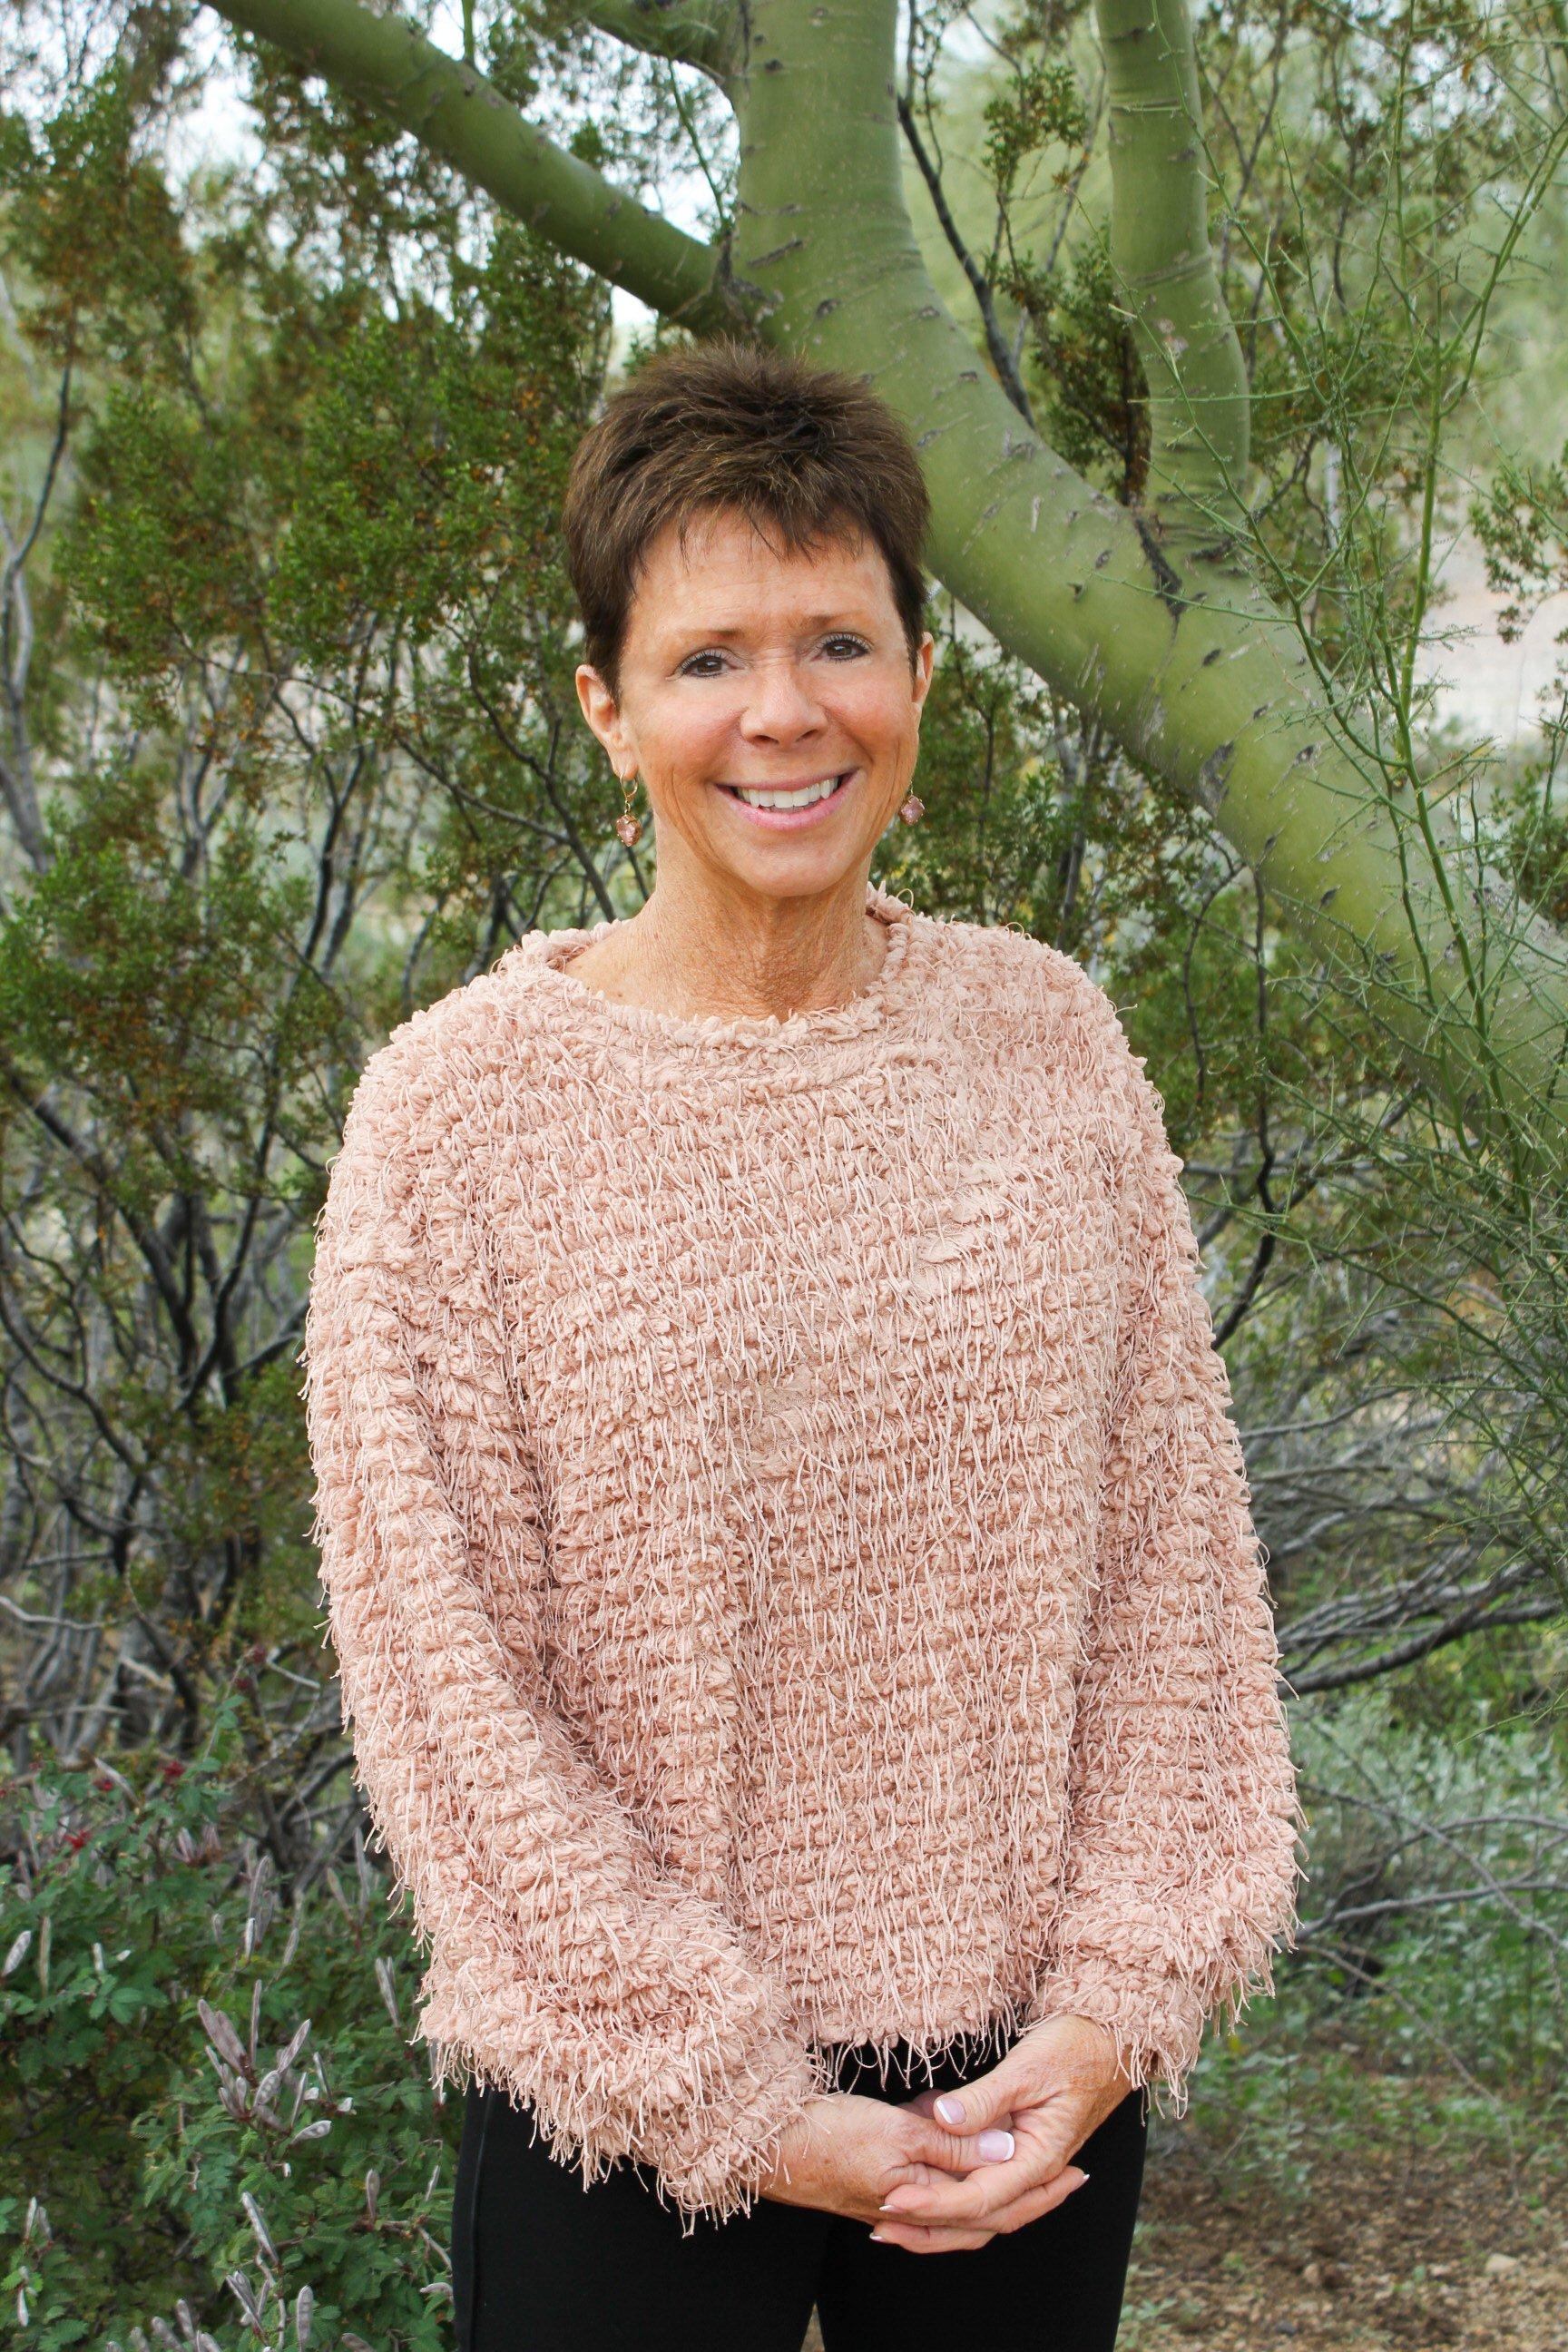 Kathy Gunning